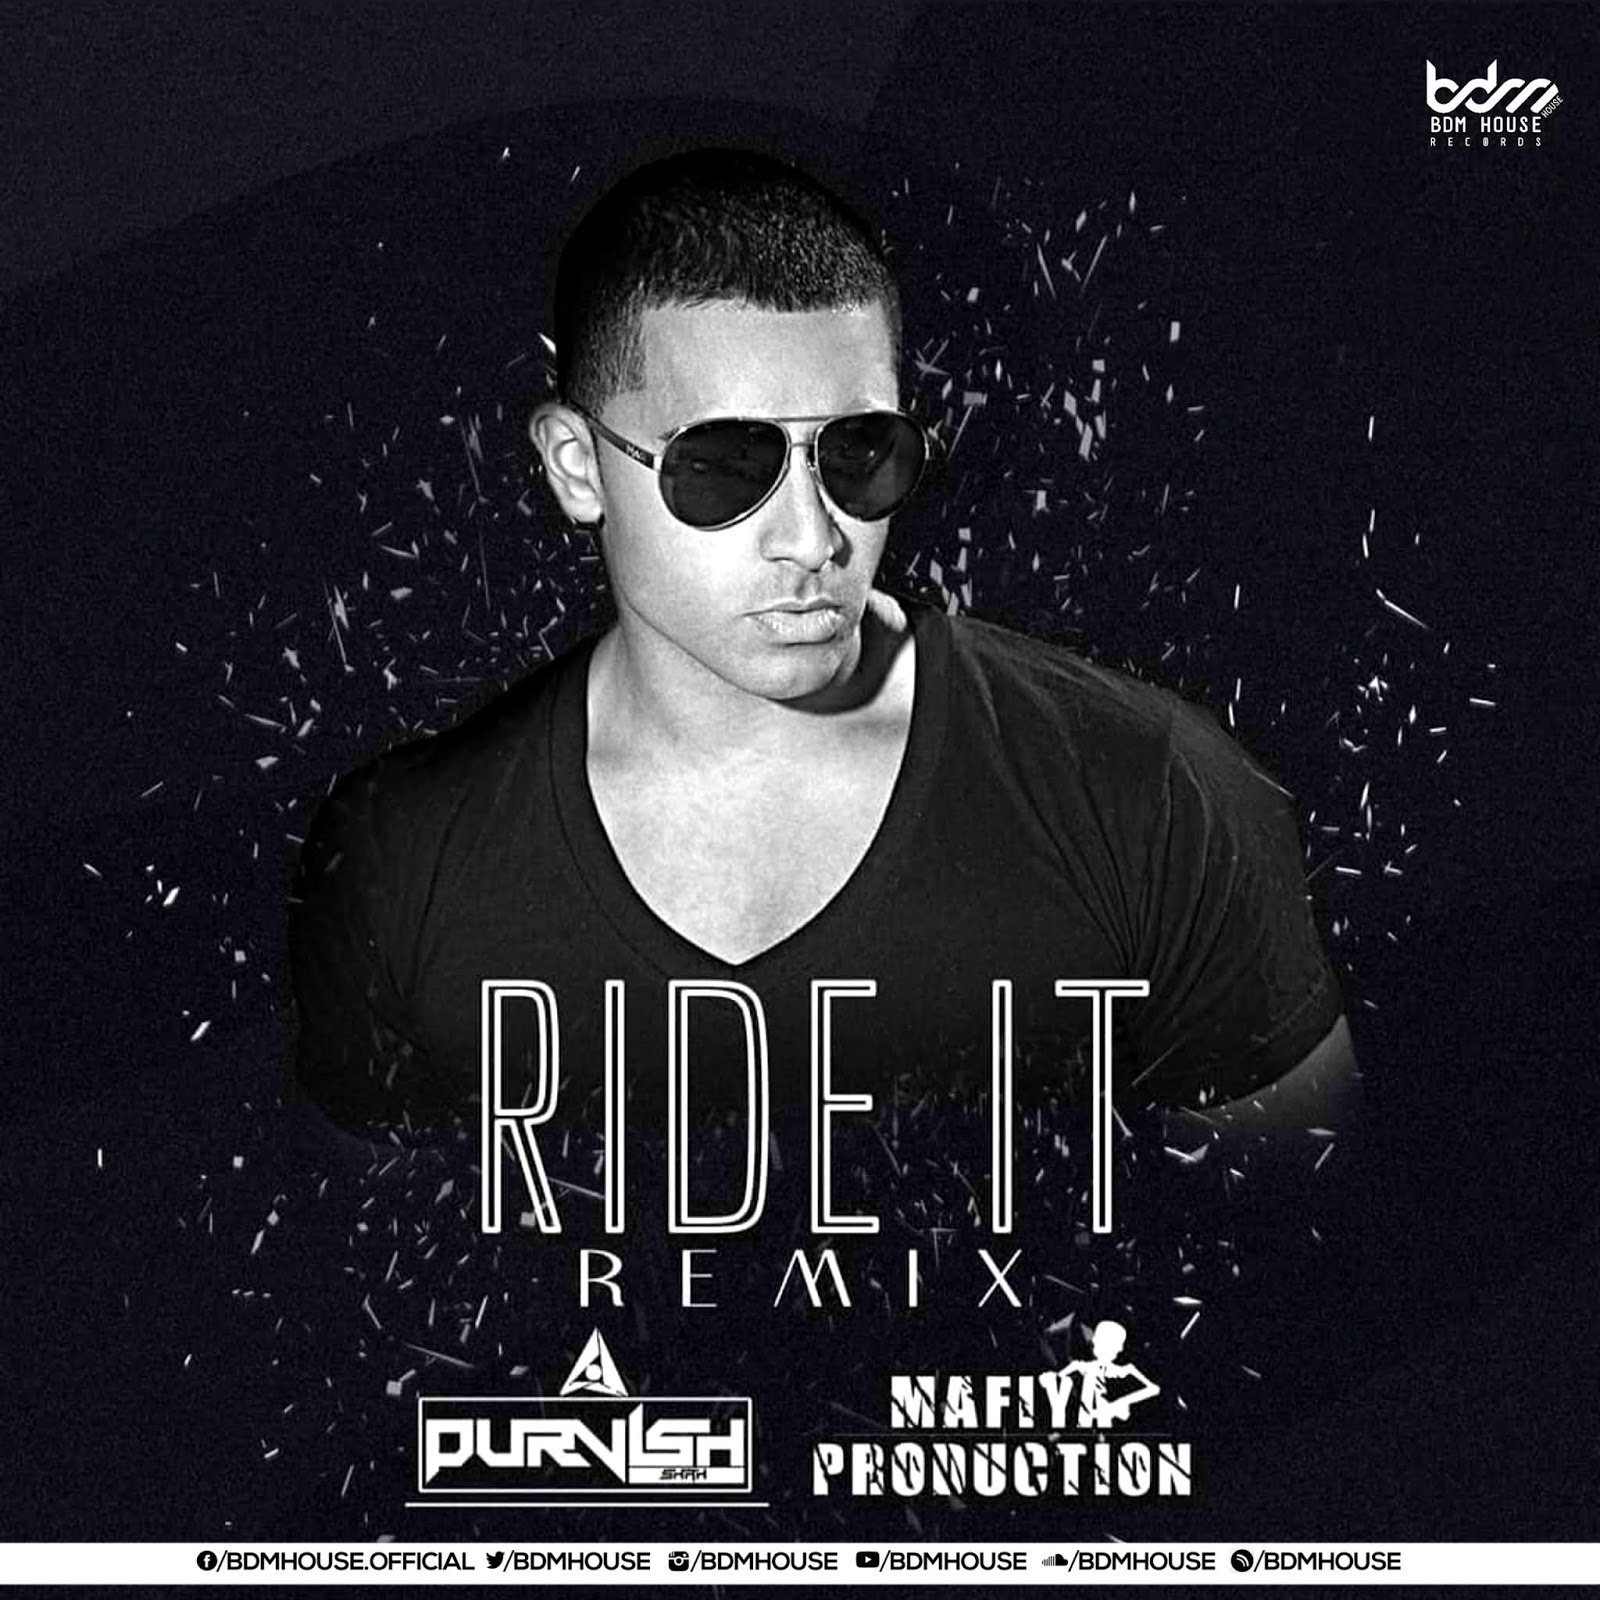 RIDE IT (REMIX) - Deejay Purvish x Mafiya Prod ( BDDJSMUSIC.COM )